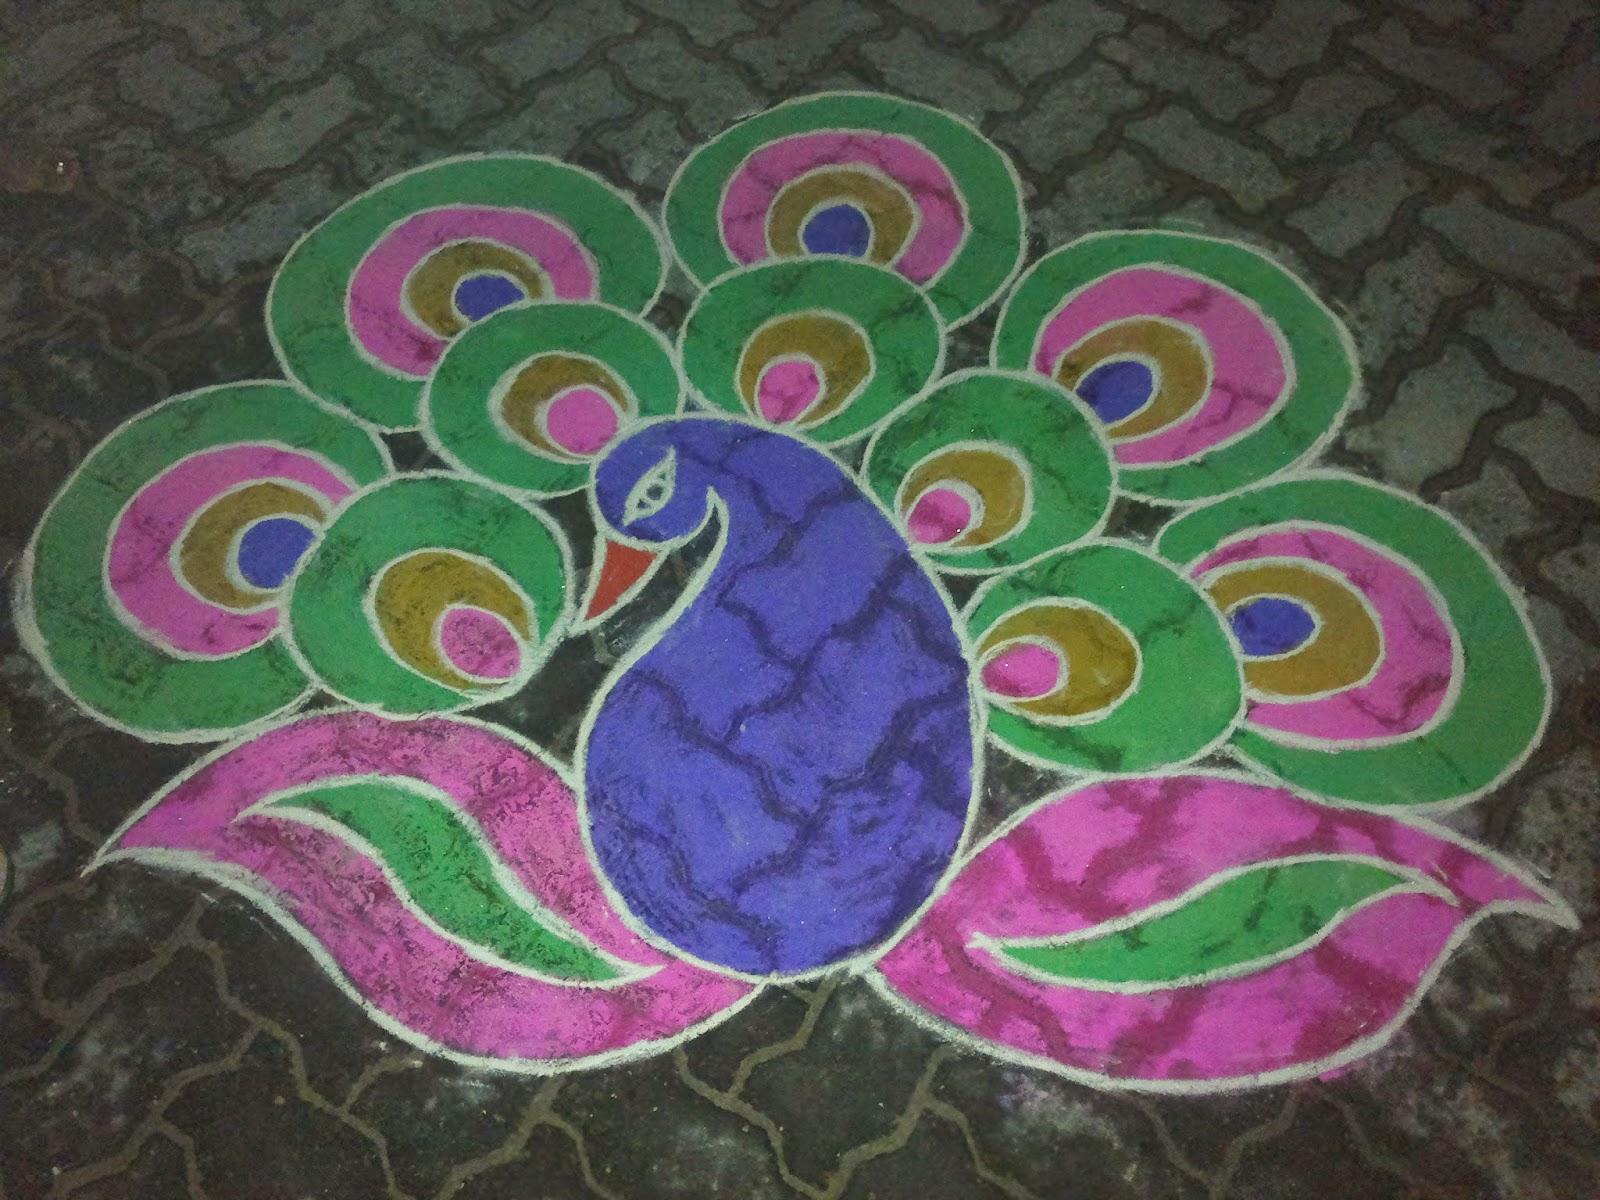 Peacock images for rangoli